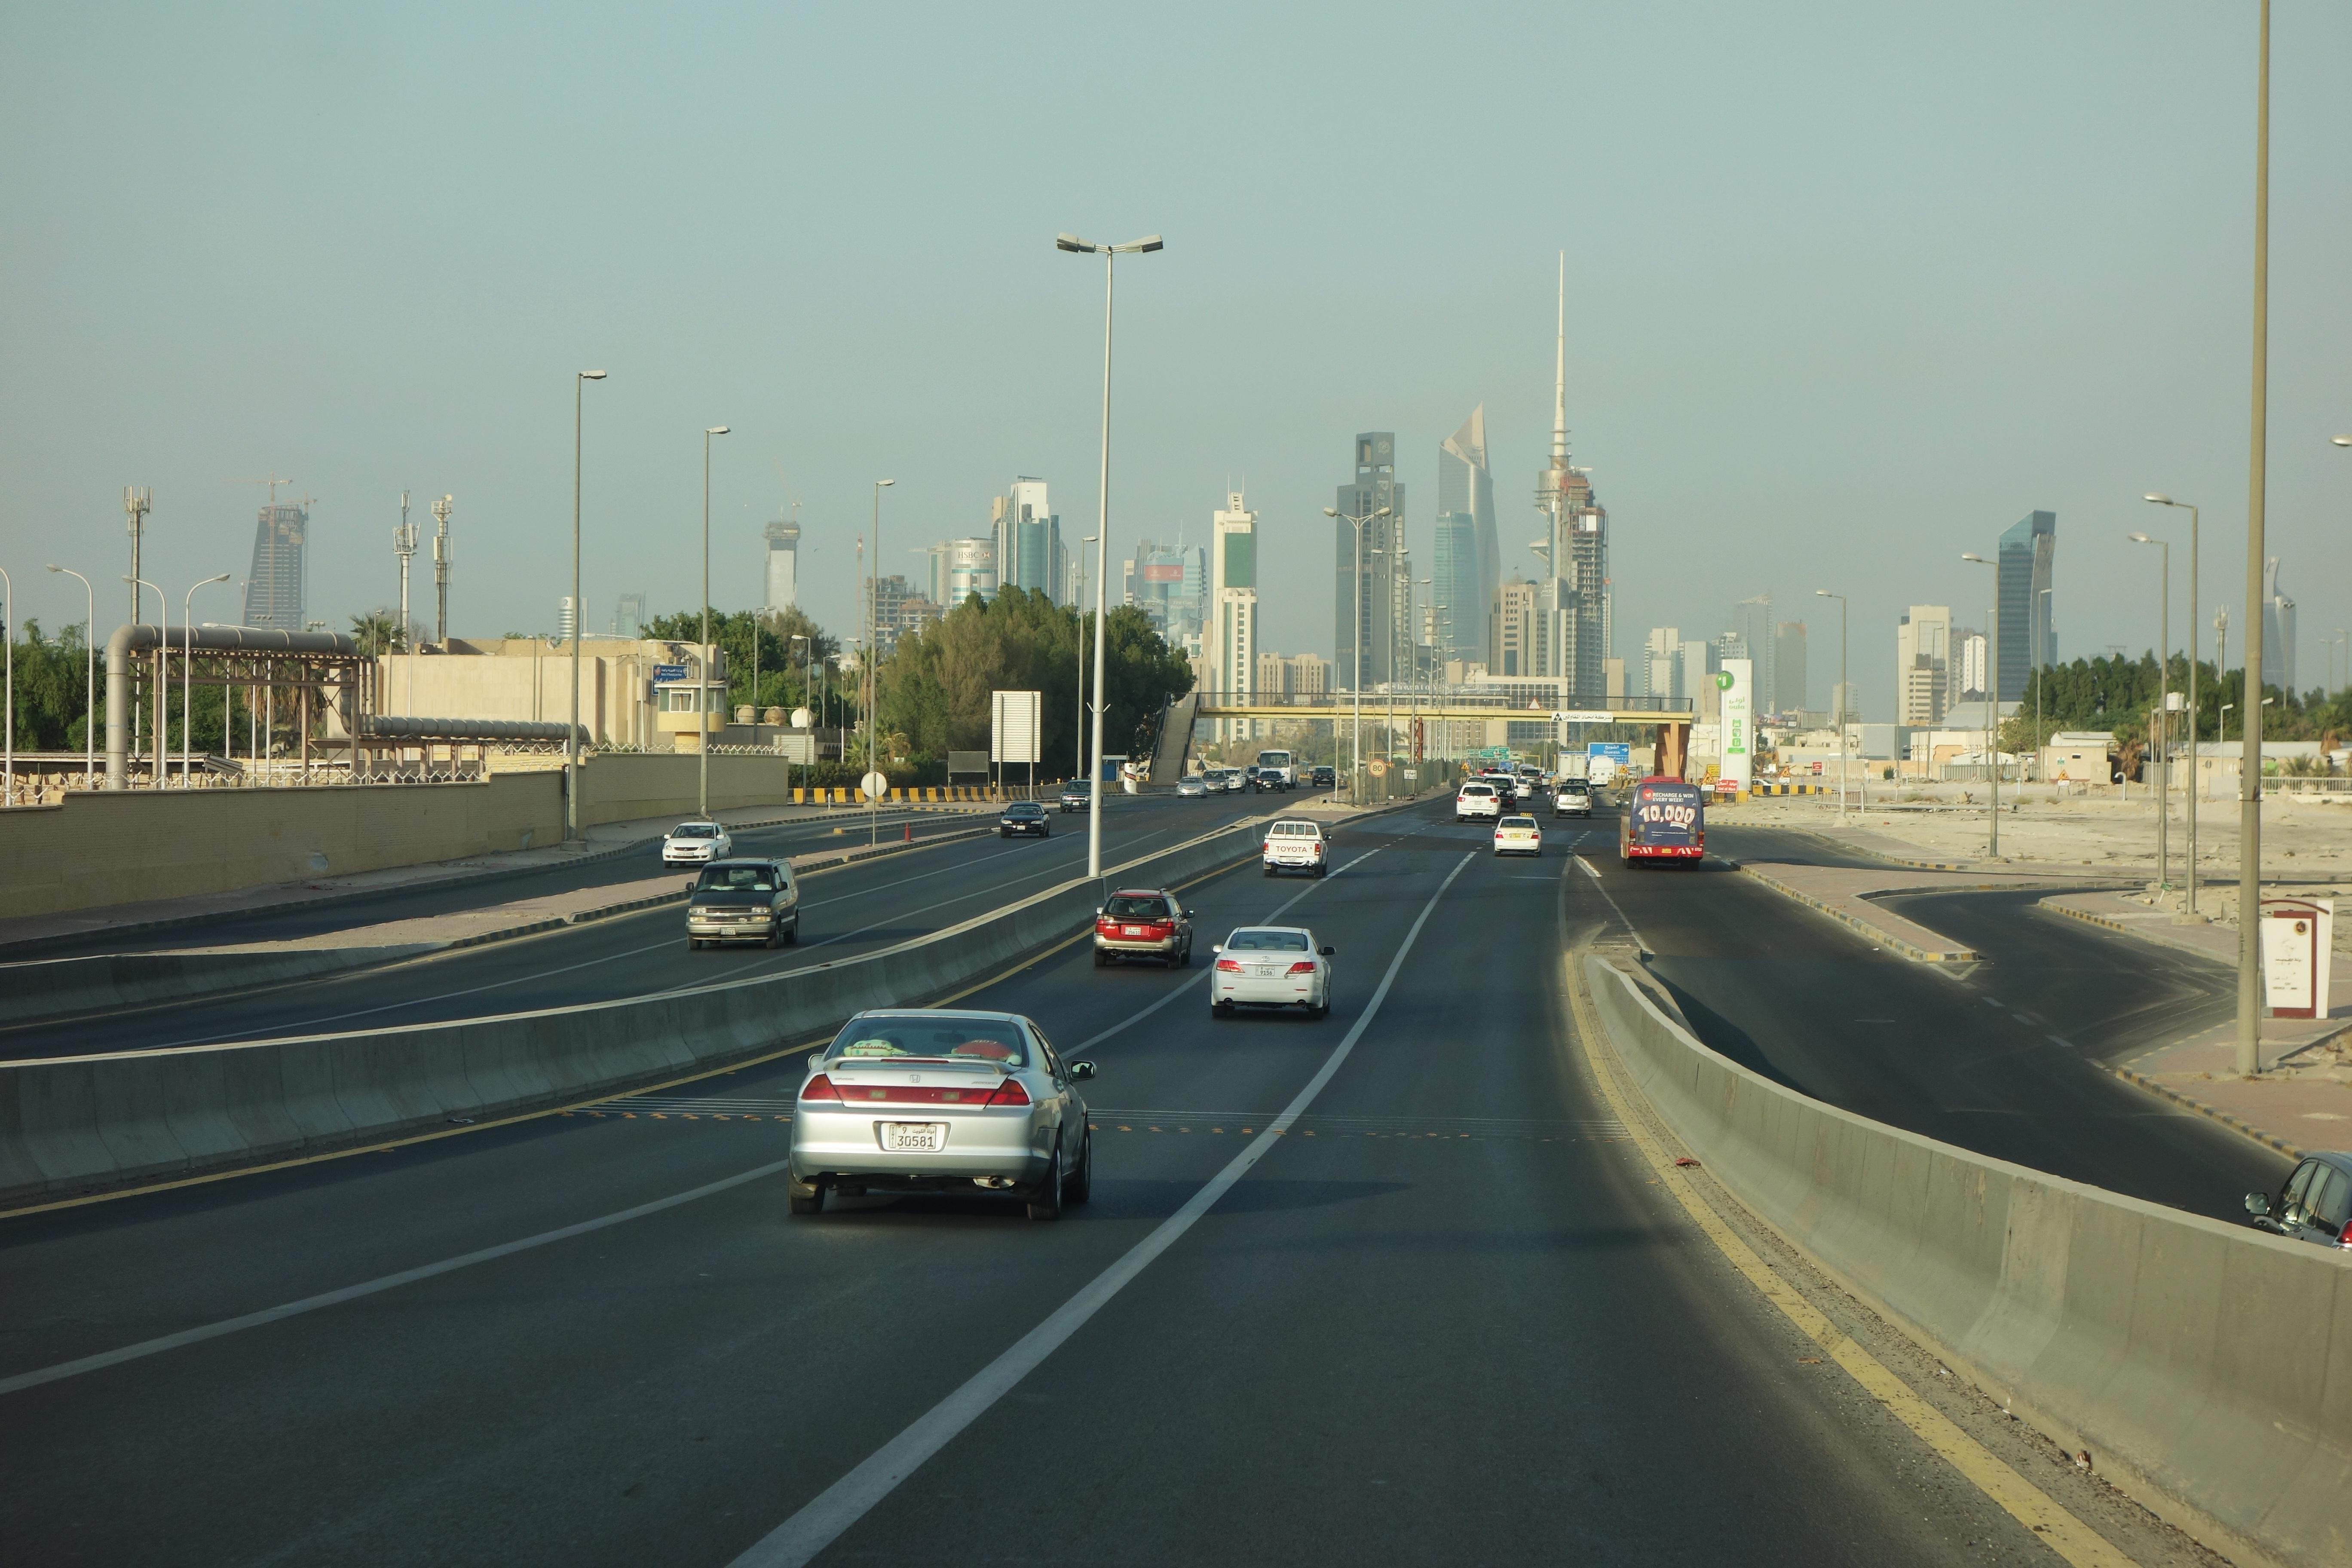 File:2012 road Kuwait 8016482071 jpg - Wikimedia Commons